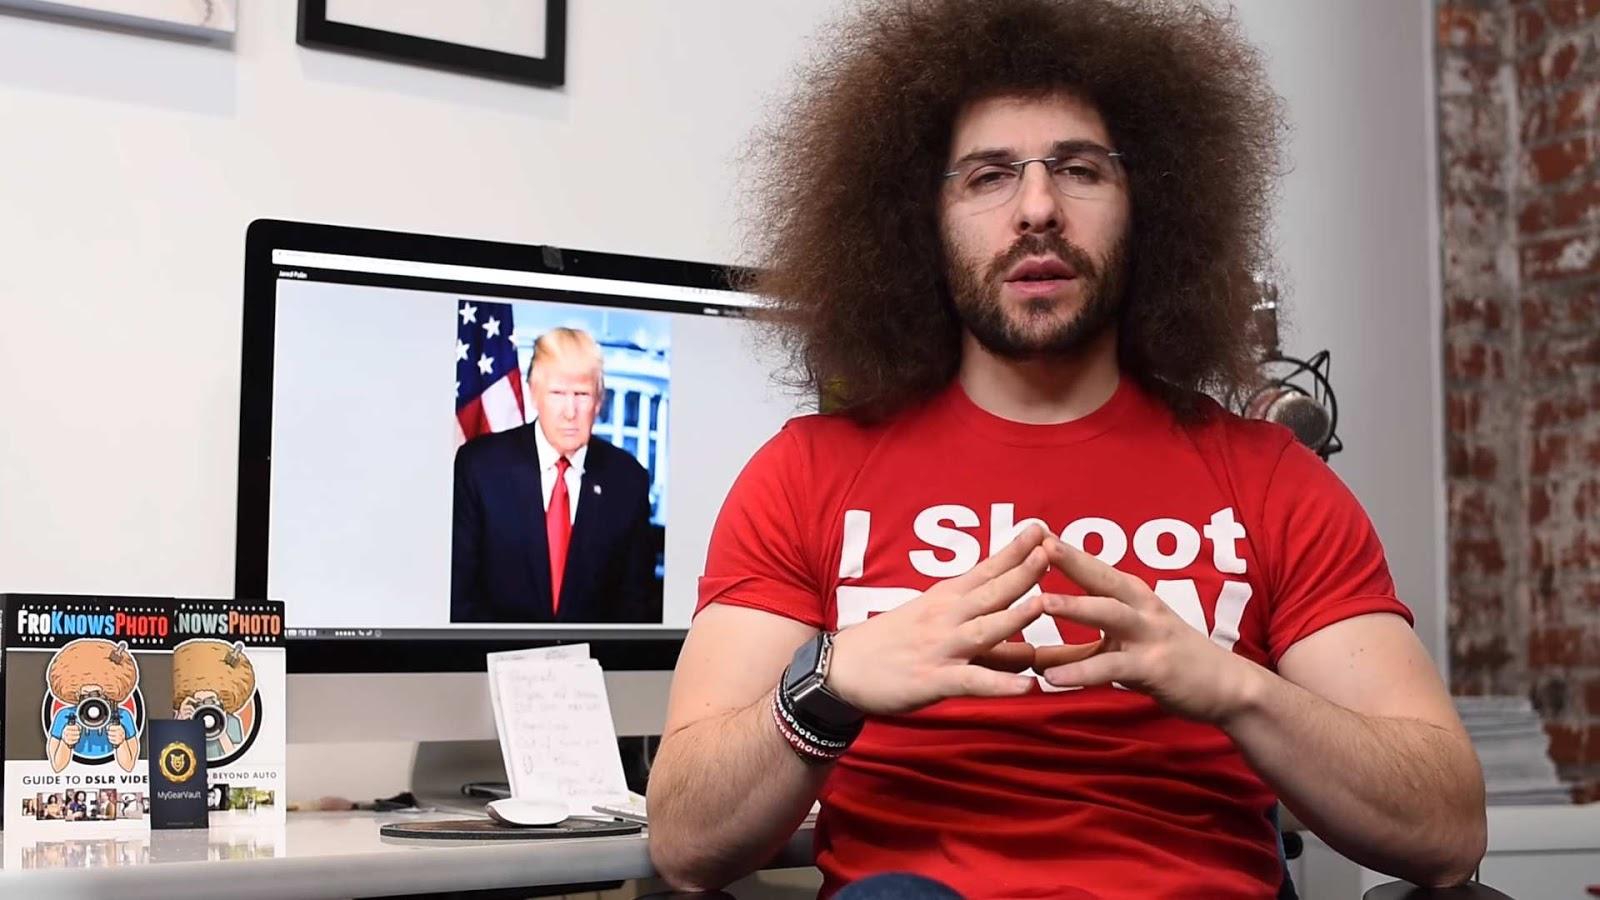 Let's break down the latest Presidential Portraits